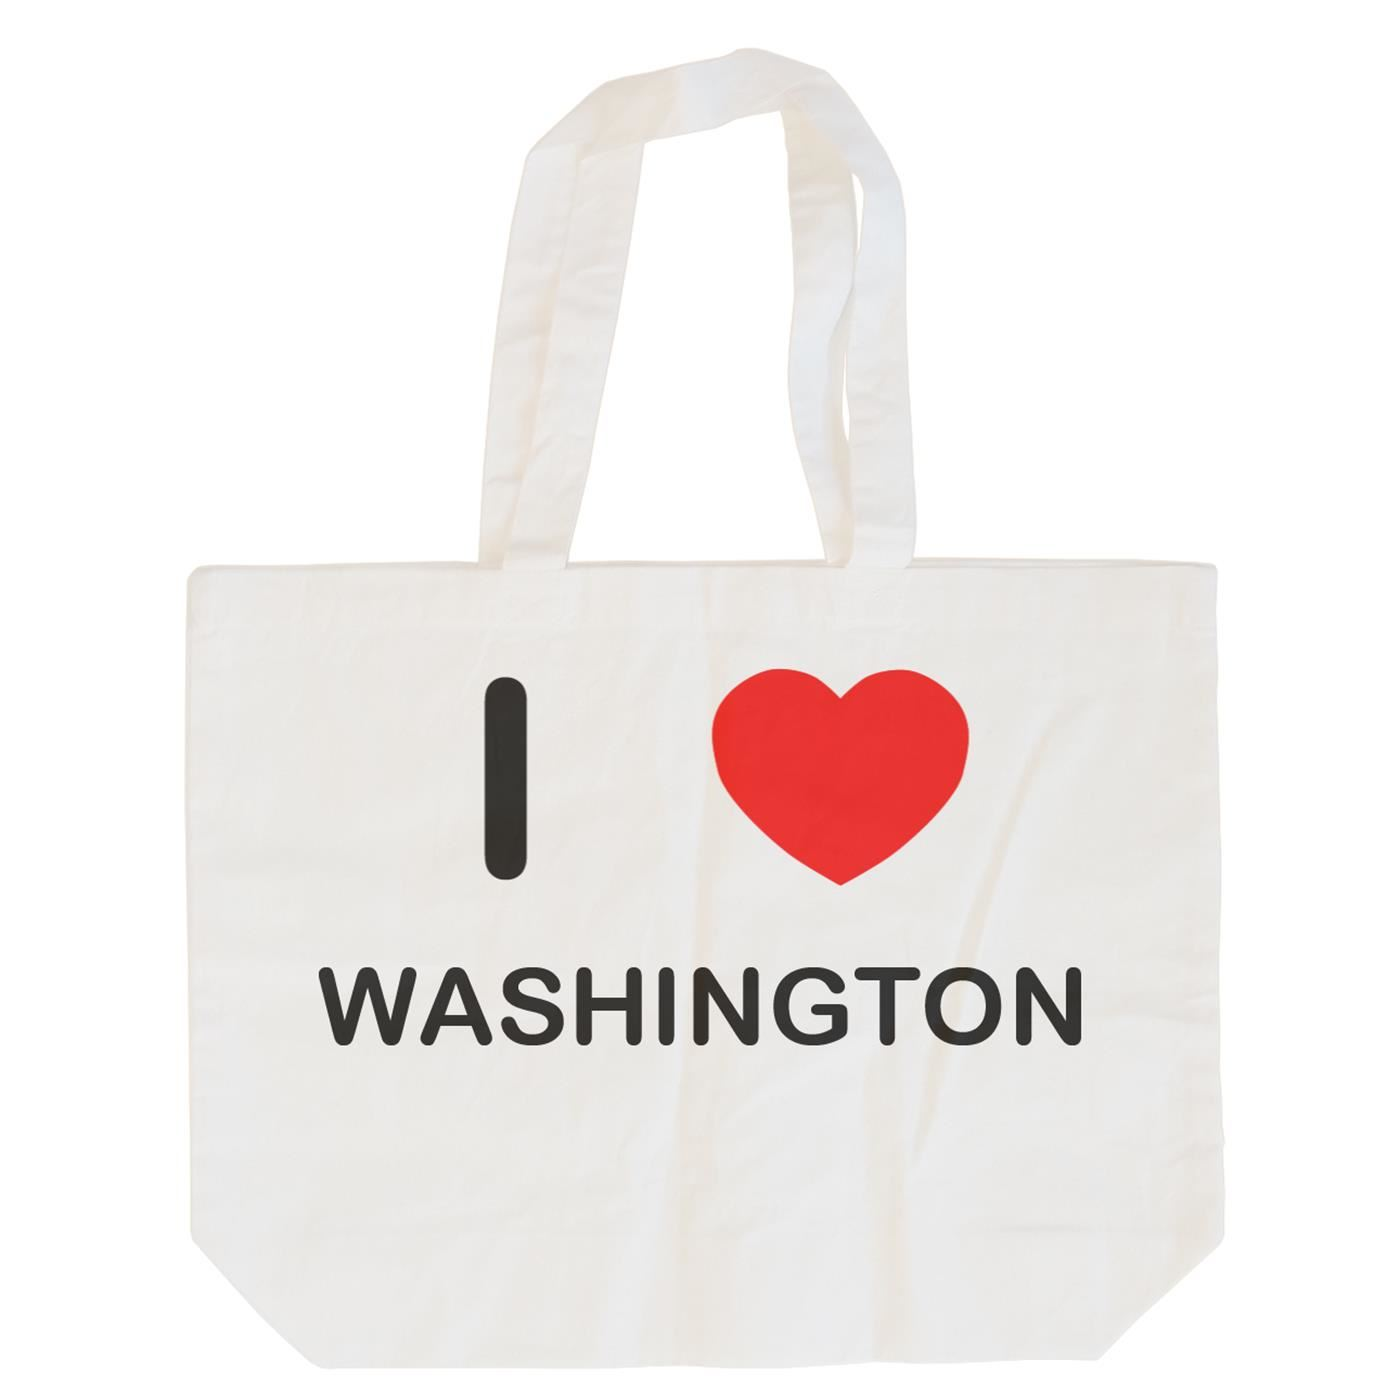 I Love Washington - Cotton Bag | Size choice Tote, Shopper or Sling